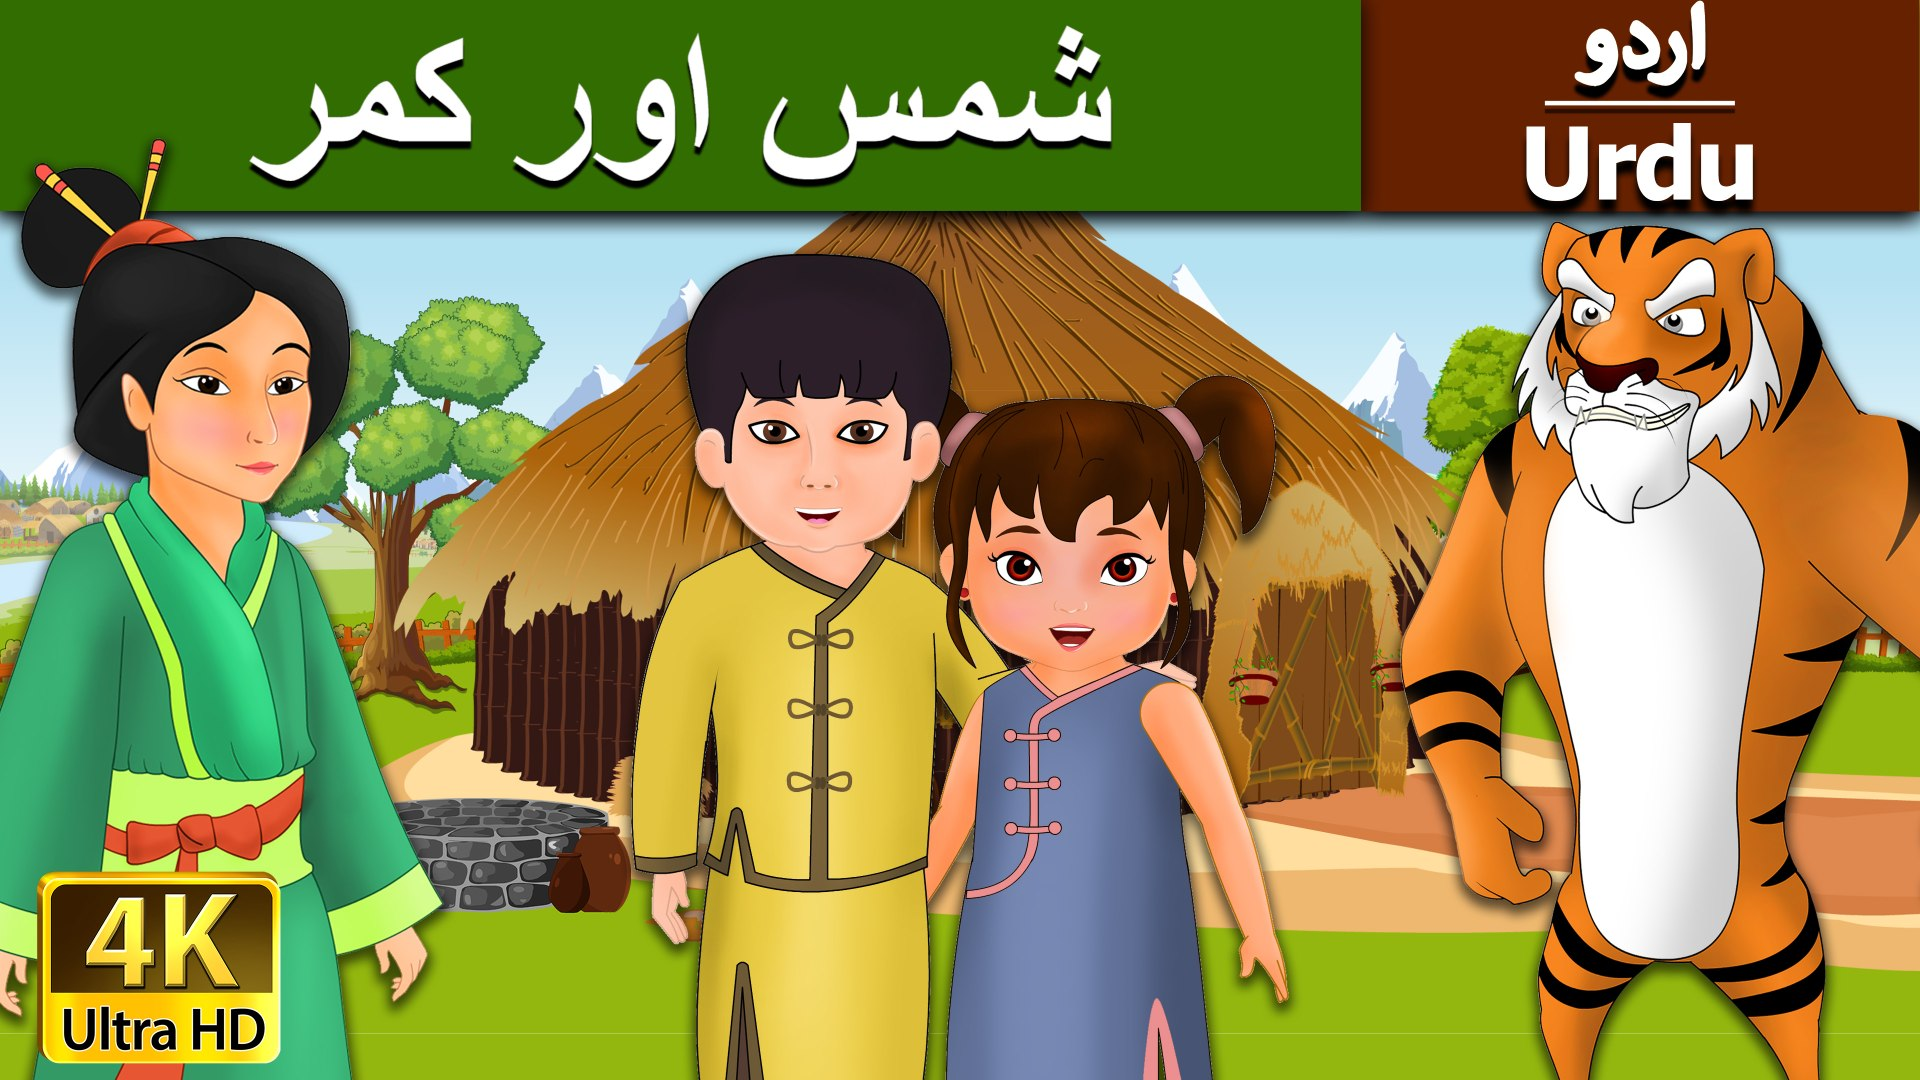 The Sun and Moon in Urdu - 4K UHD - Urdu Fairy Tales